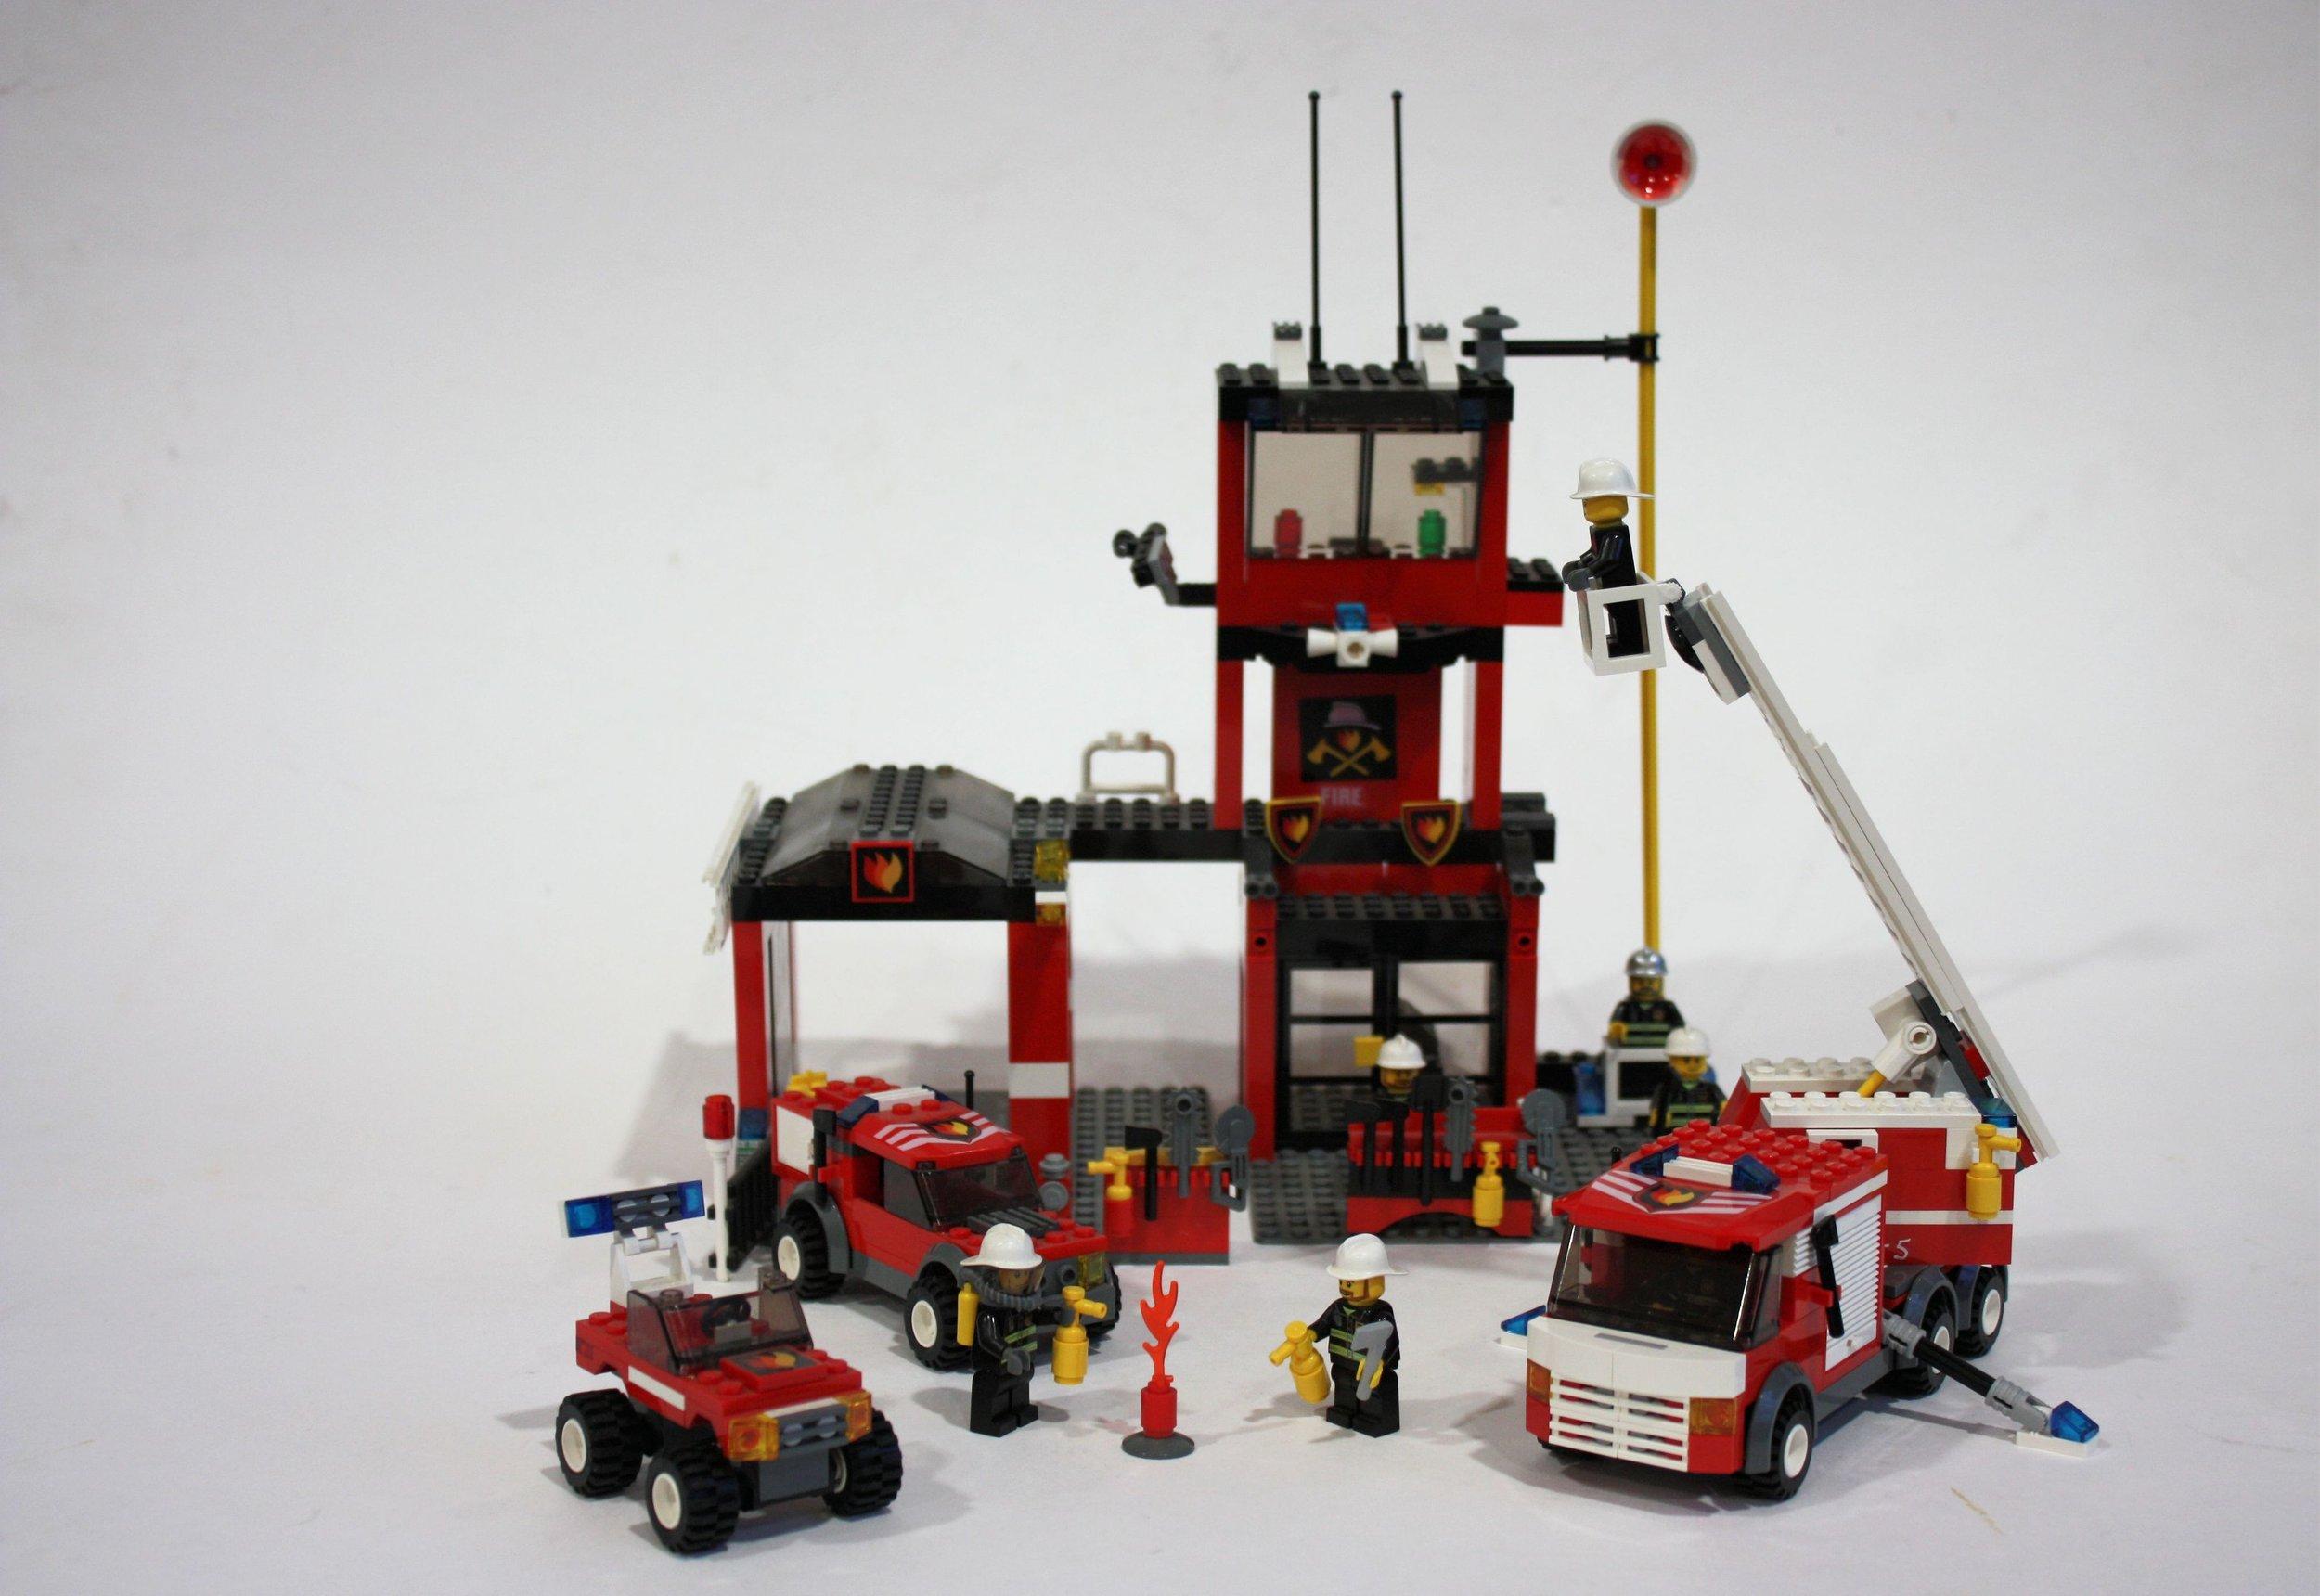 LEGO Feuerwehr02.jpg